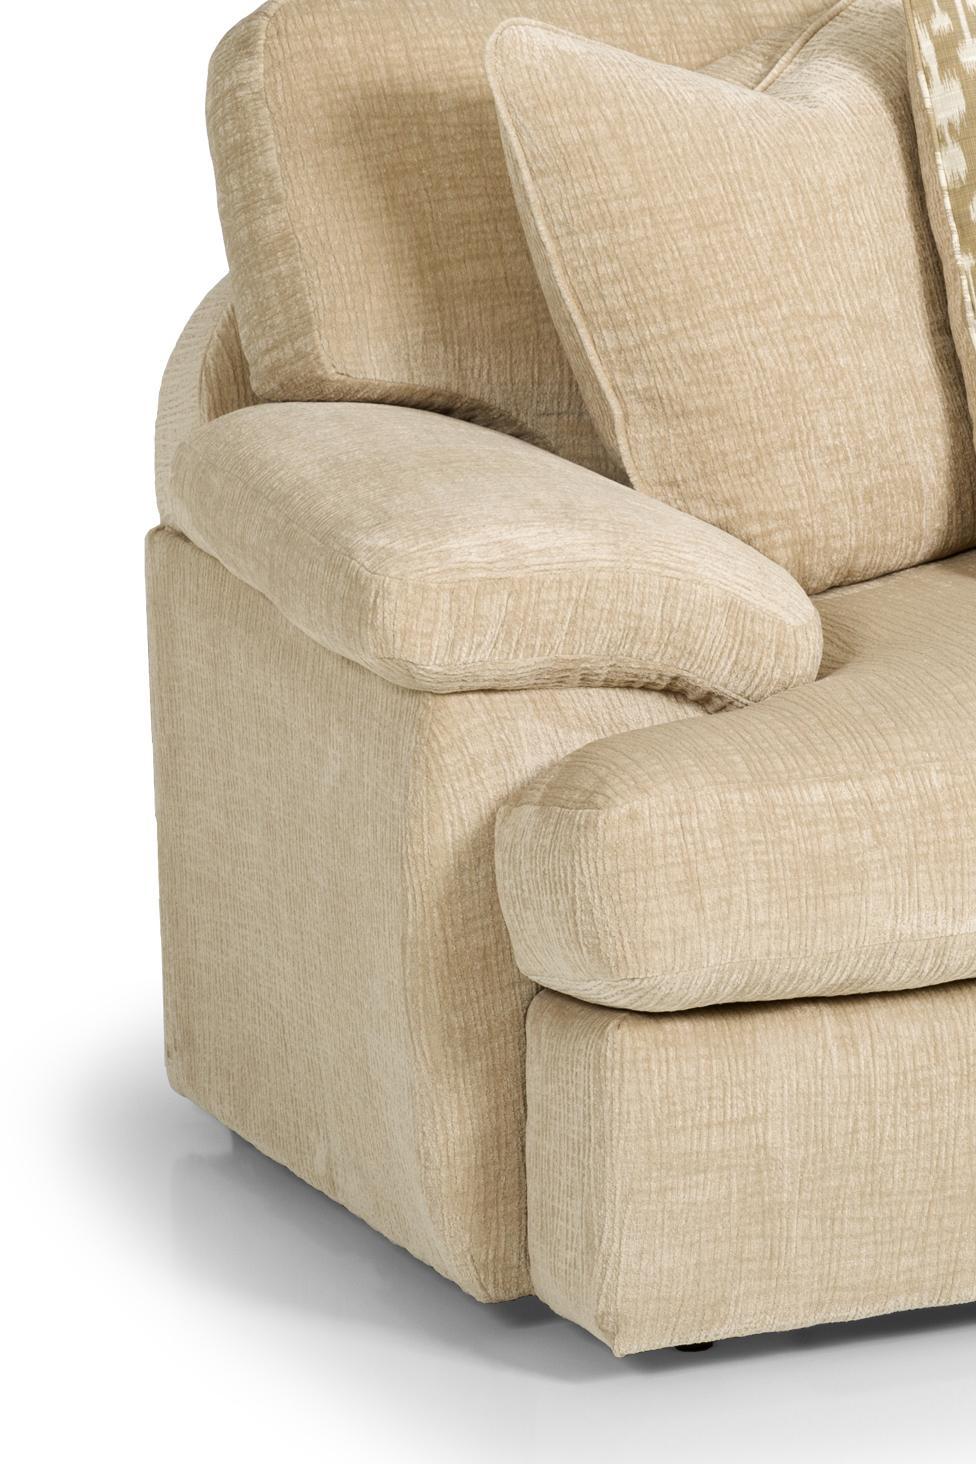 Marvelous 186 186 By Sunset Home Sadlers Home Furnishings Interior Design Ideas Truasarkarijobsexamcom